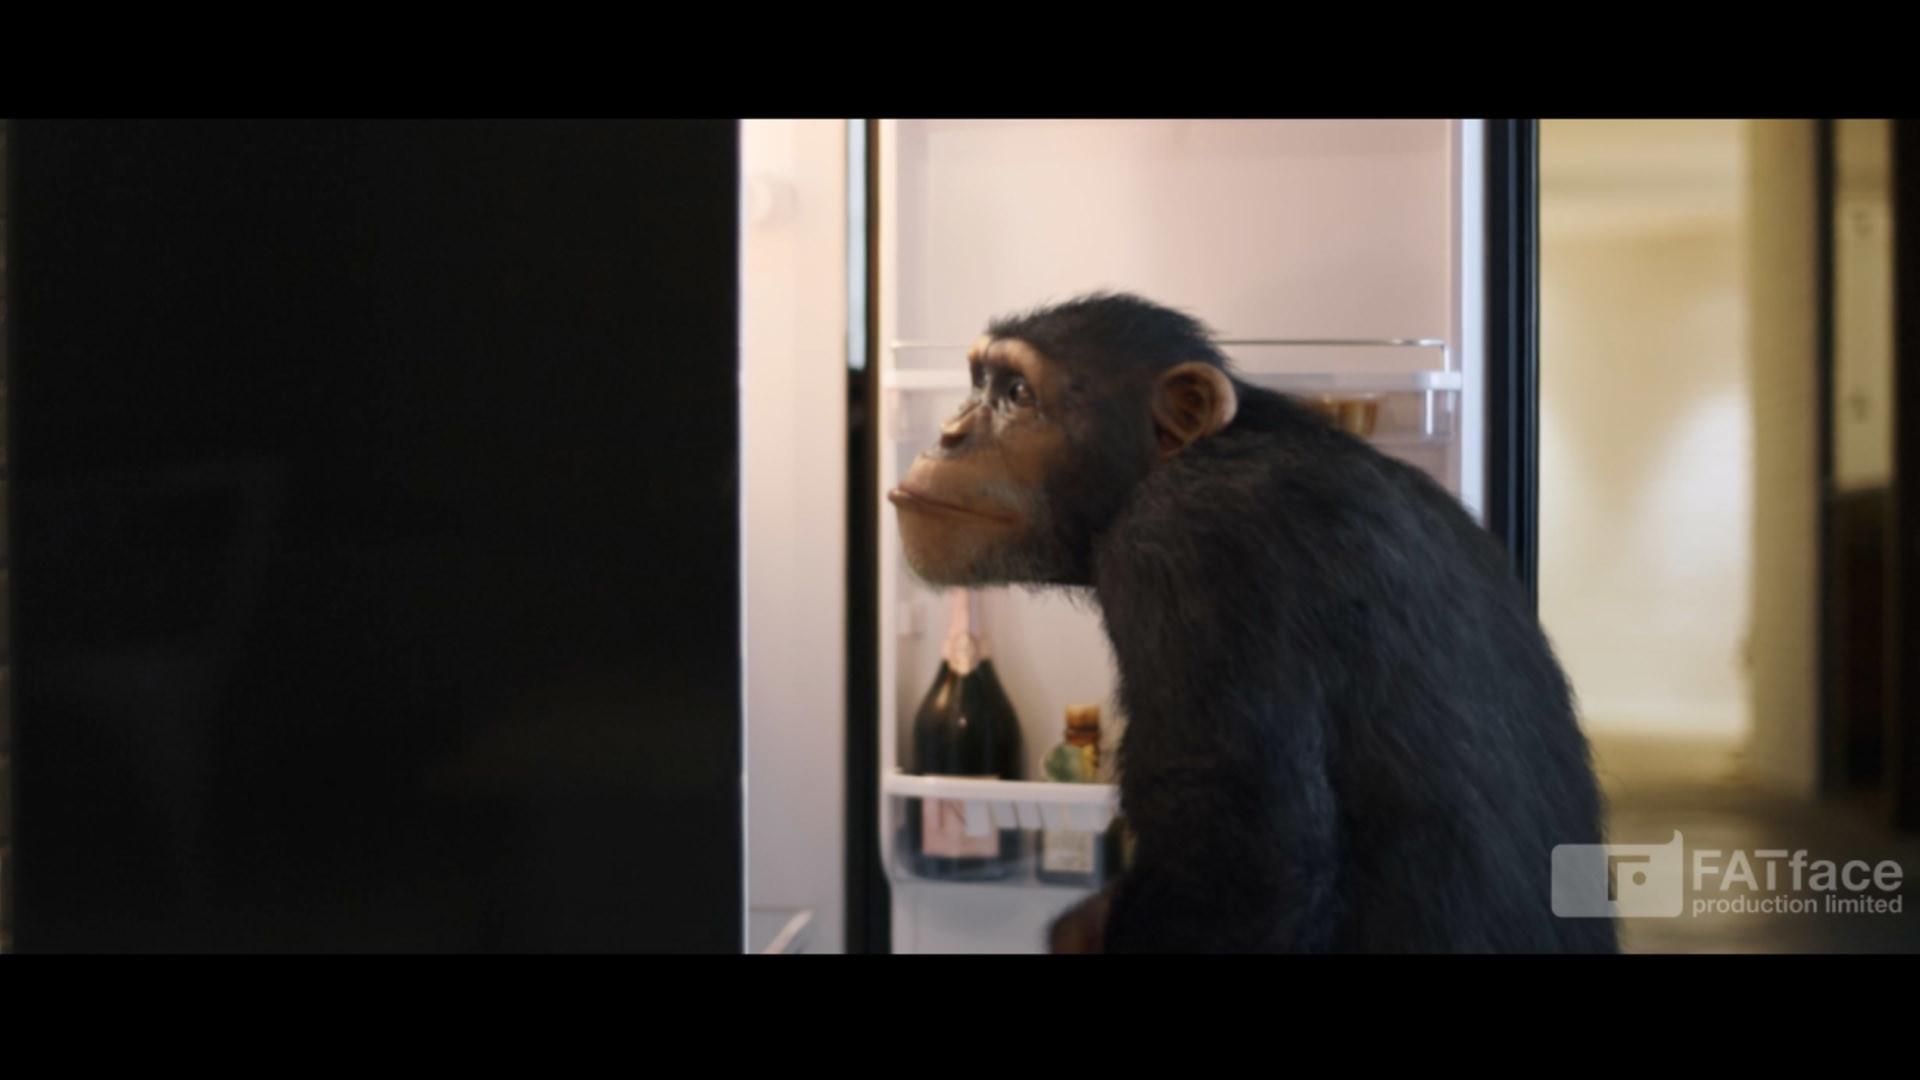 Nelson tai chimpanzee dsgn screens 001c